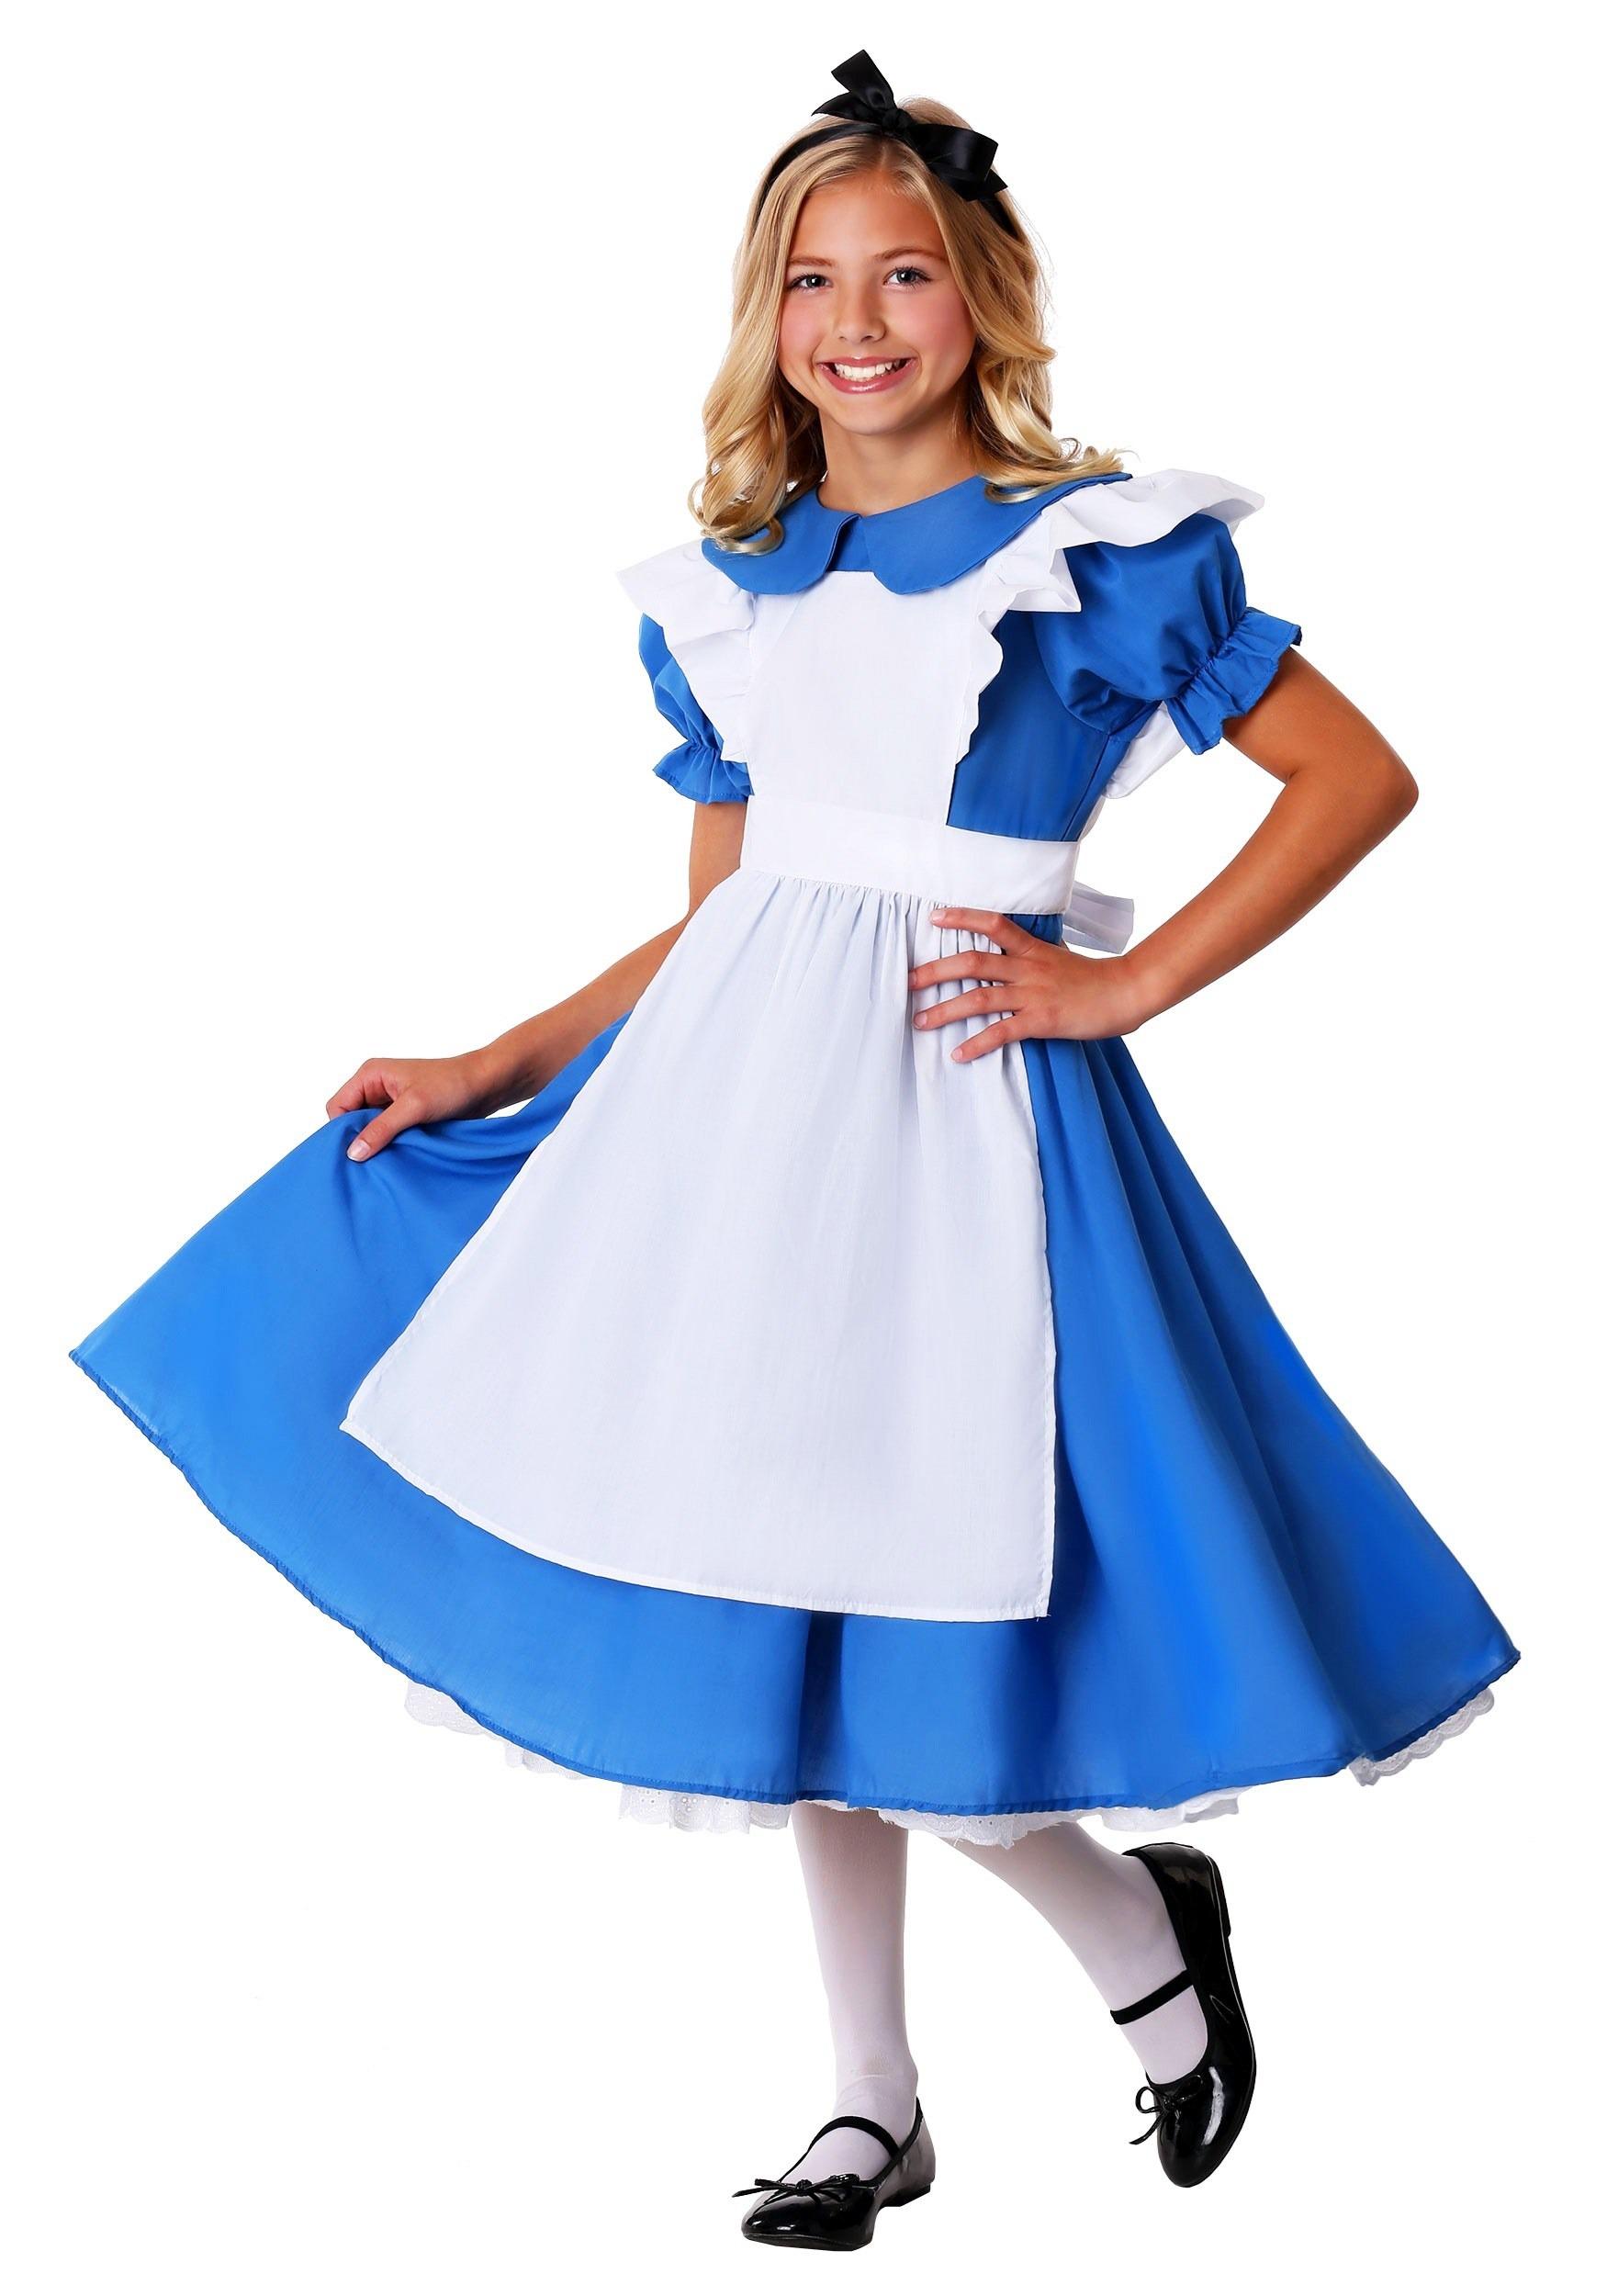 White apron for alice in wonderland costume - White Apron For Alice In Wonderland Costume 79